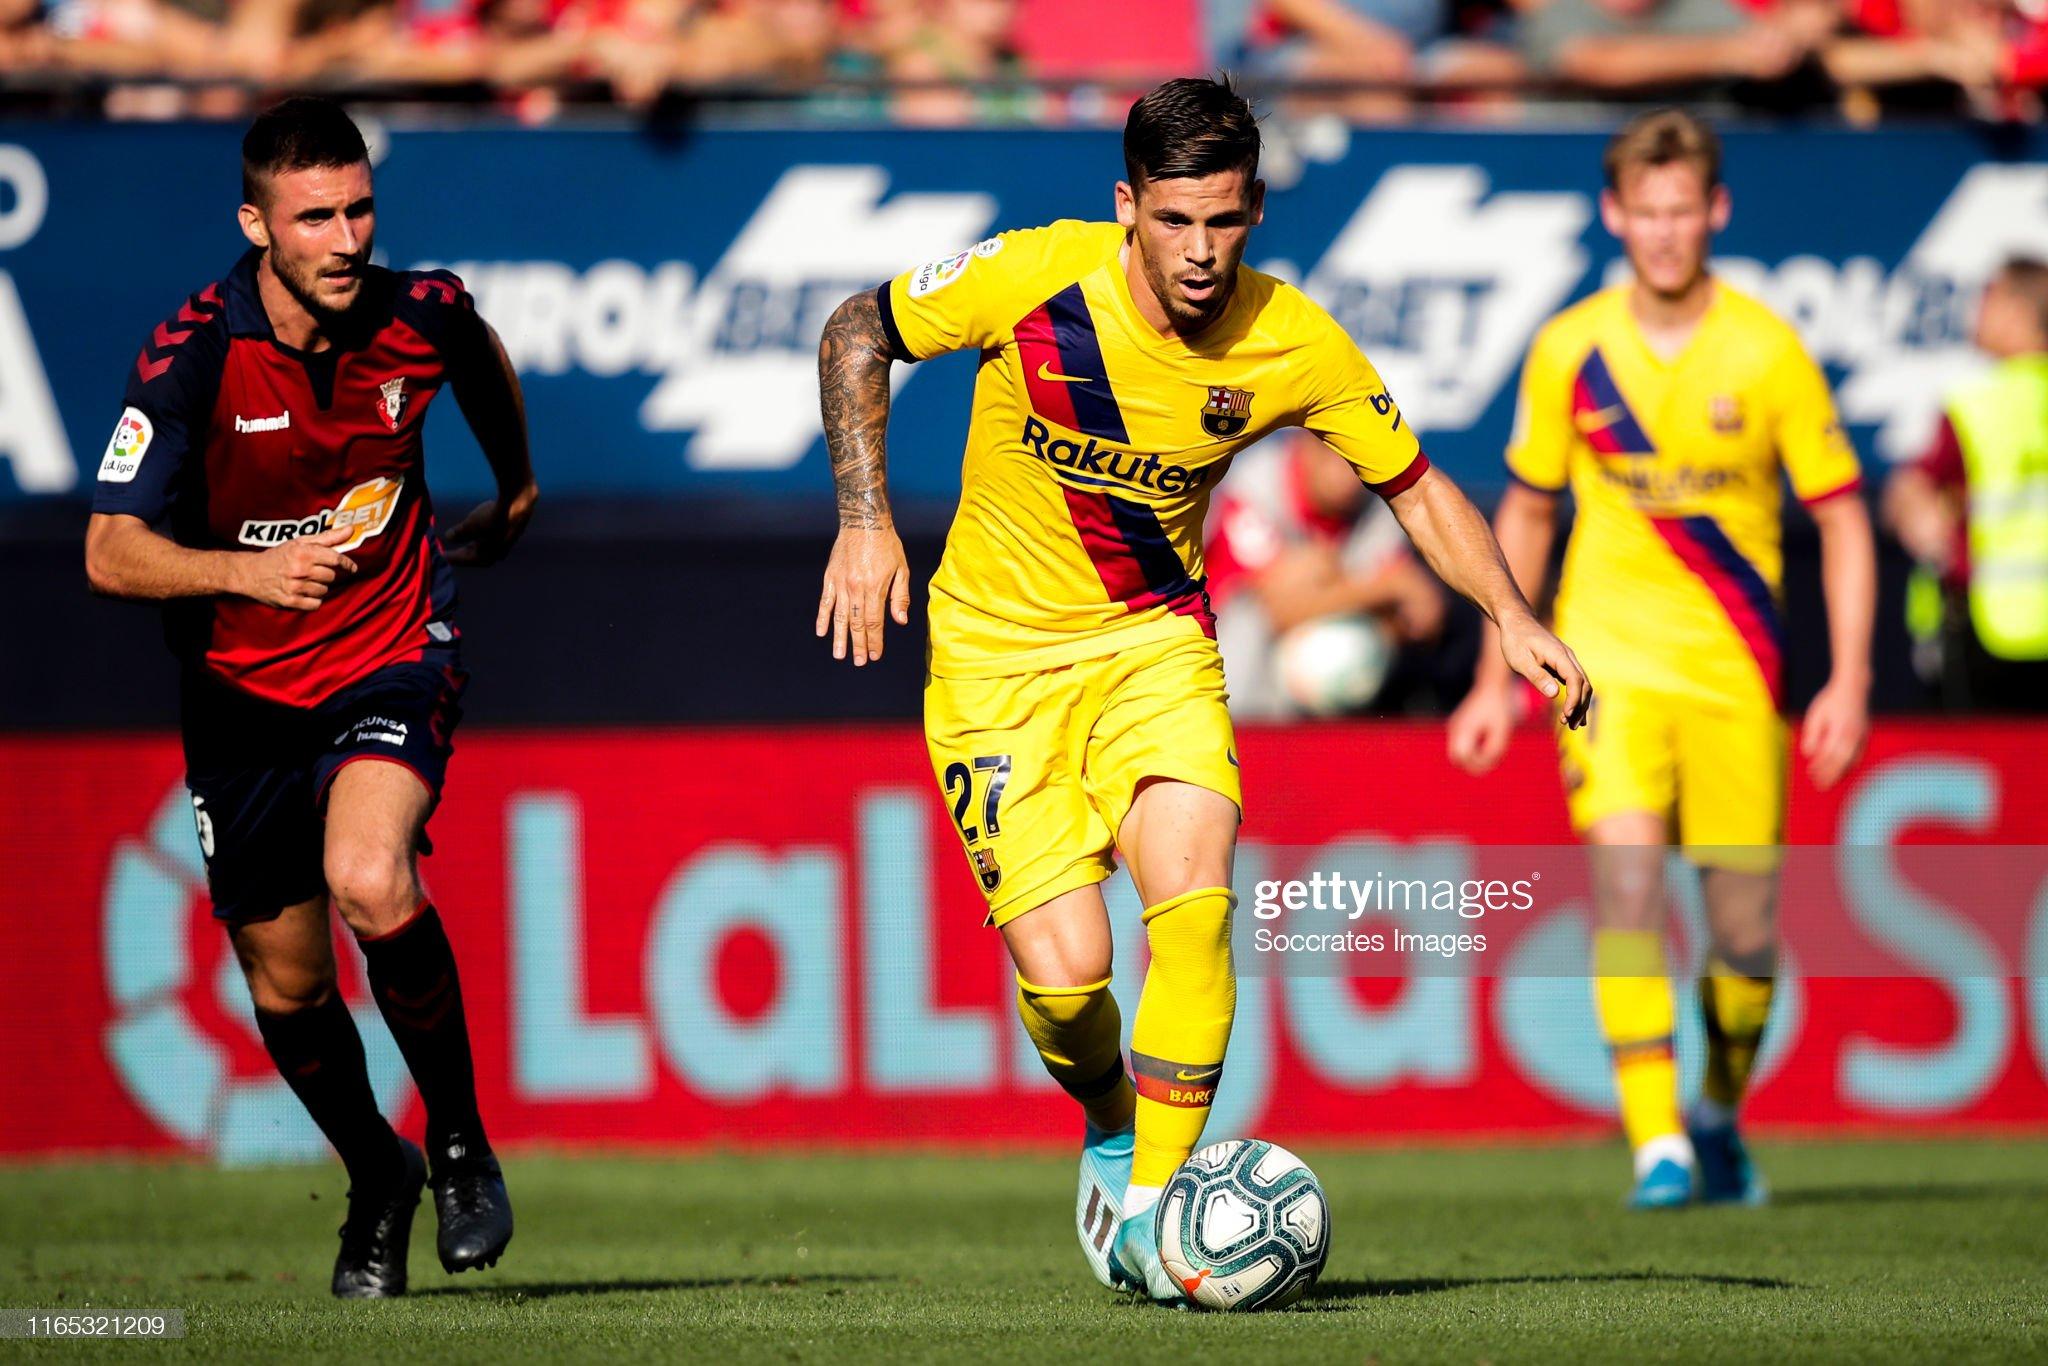 صور مباراة : أوساسونا - برشلونة 2-2 ( 31-08-2019 )  Carles-perez-of-fc-barcelona-during-the-la-liga-santander-match-v-picture-id1165321209?s=2048x2048